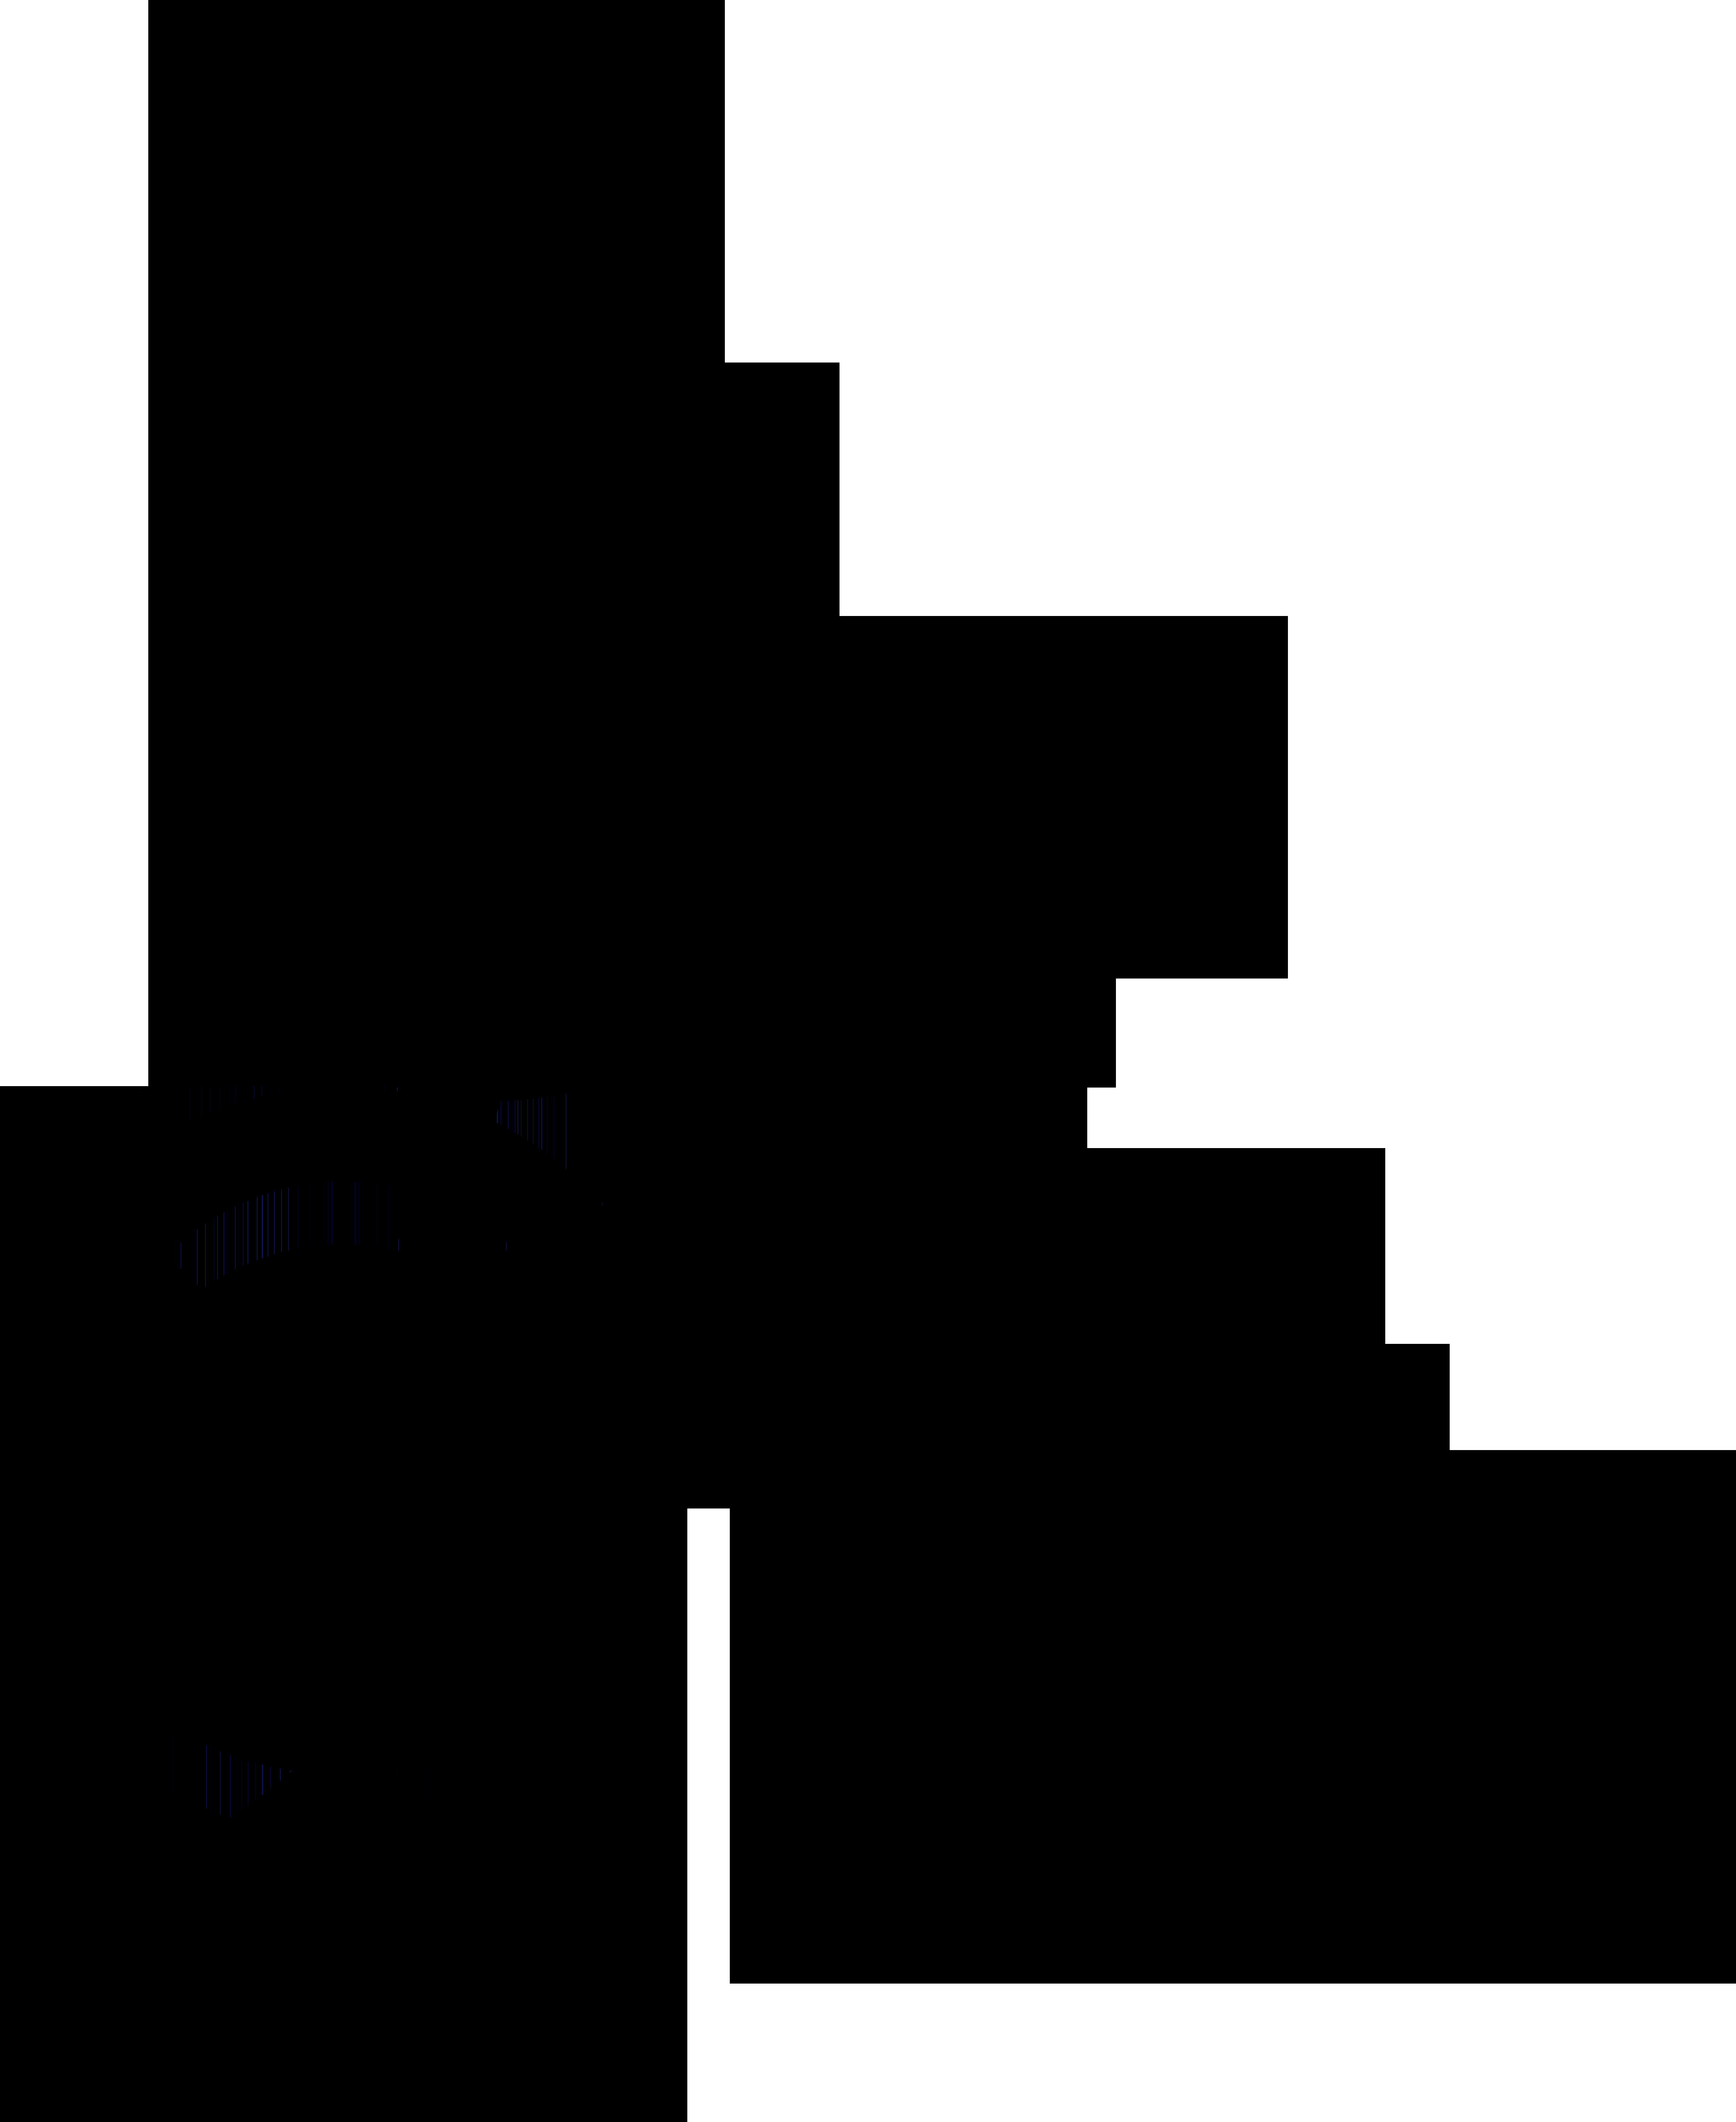 Mars symbol interlocked with nonbinary, Venus and Mars symbols.